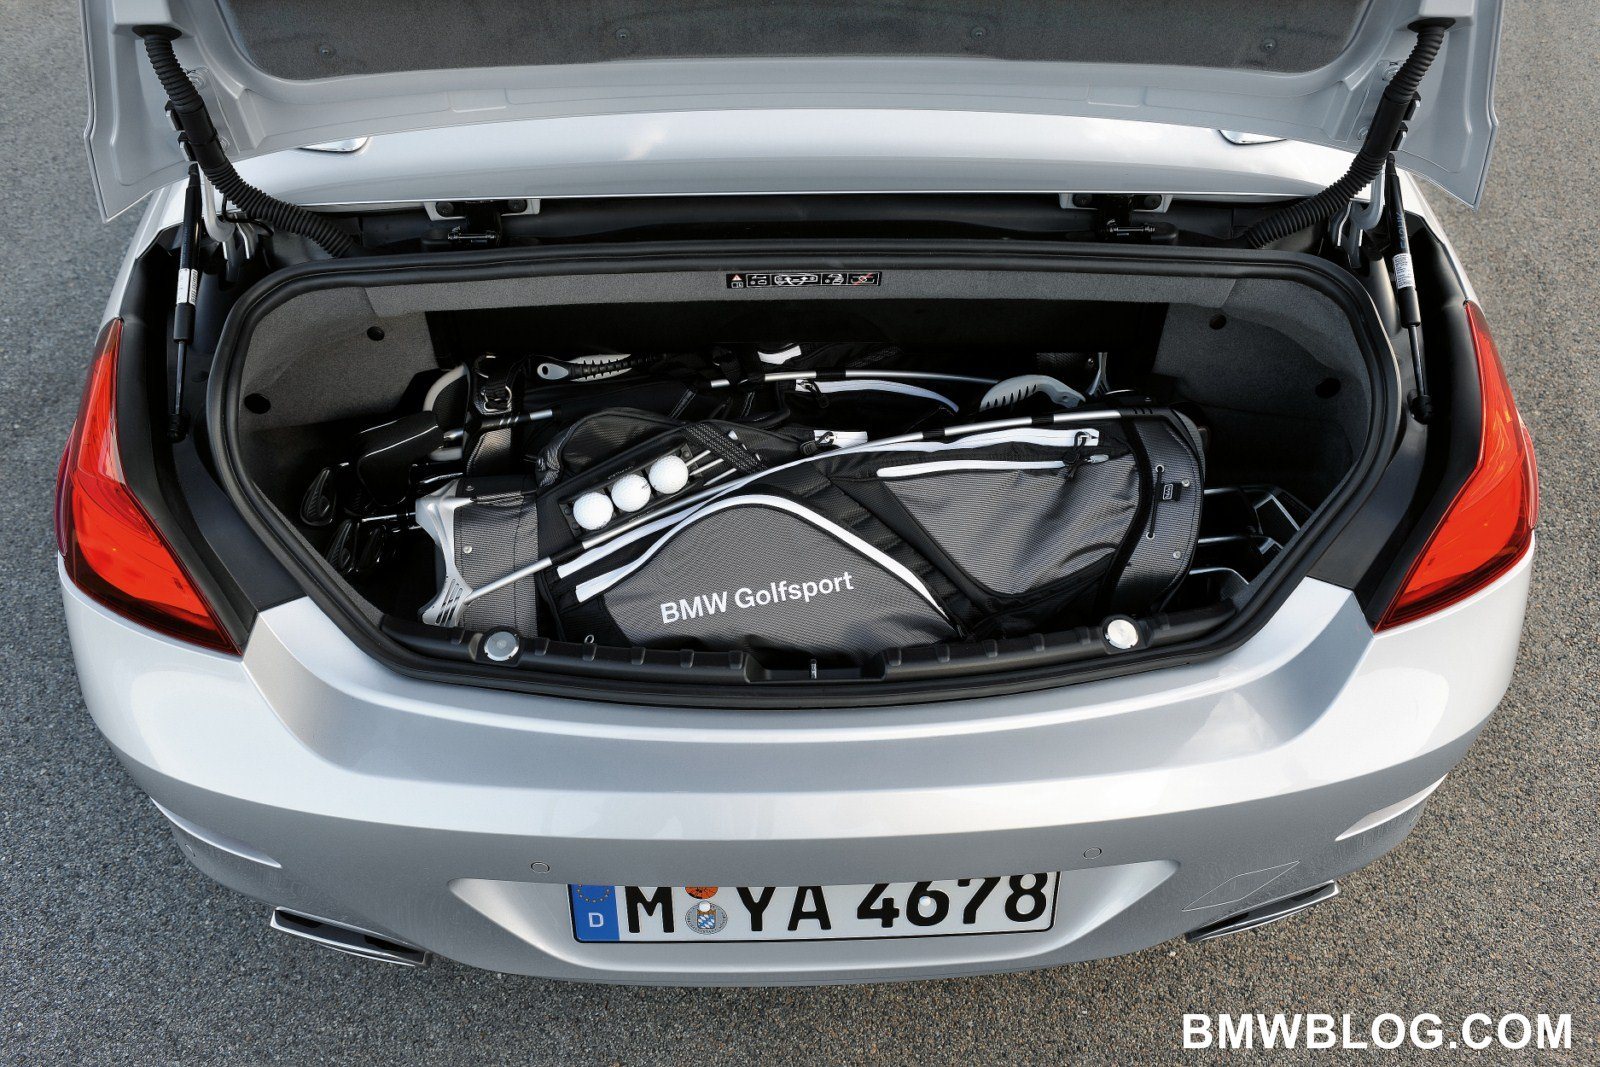 2011 bmw 6 series cabrio 310